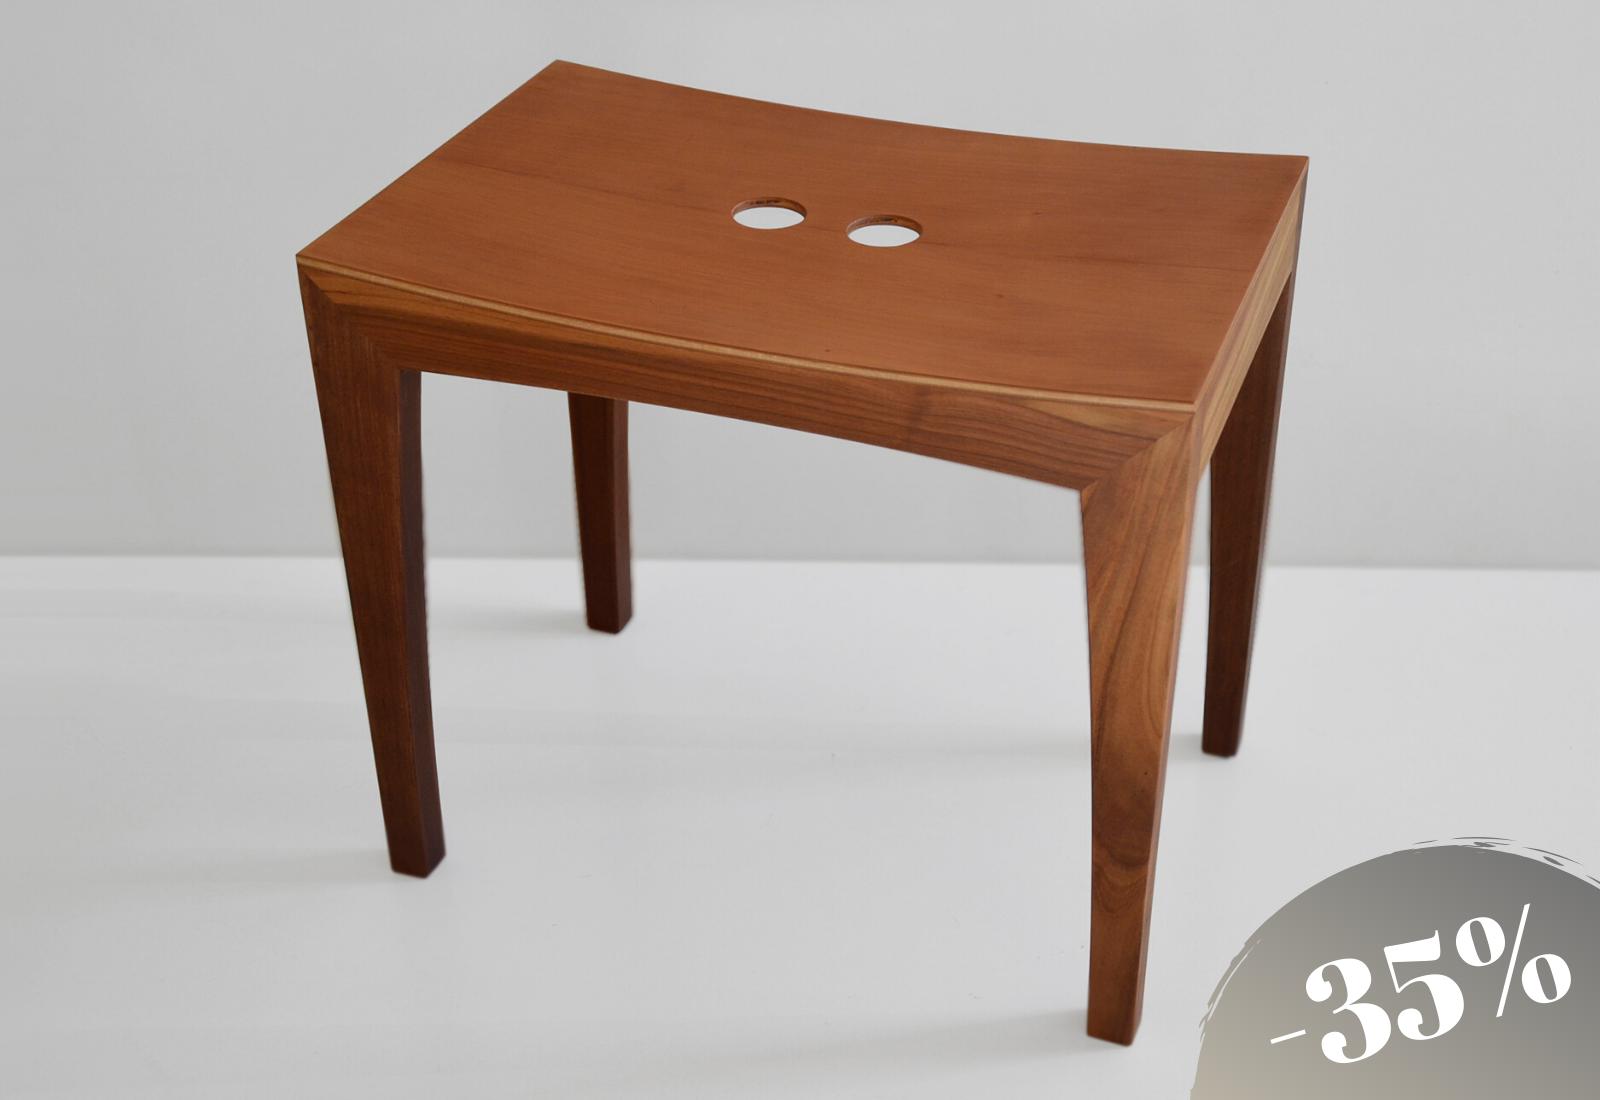 OTTO1 stool pear